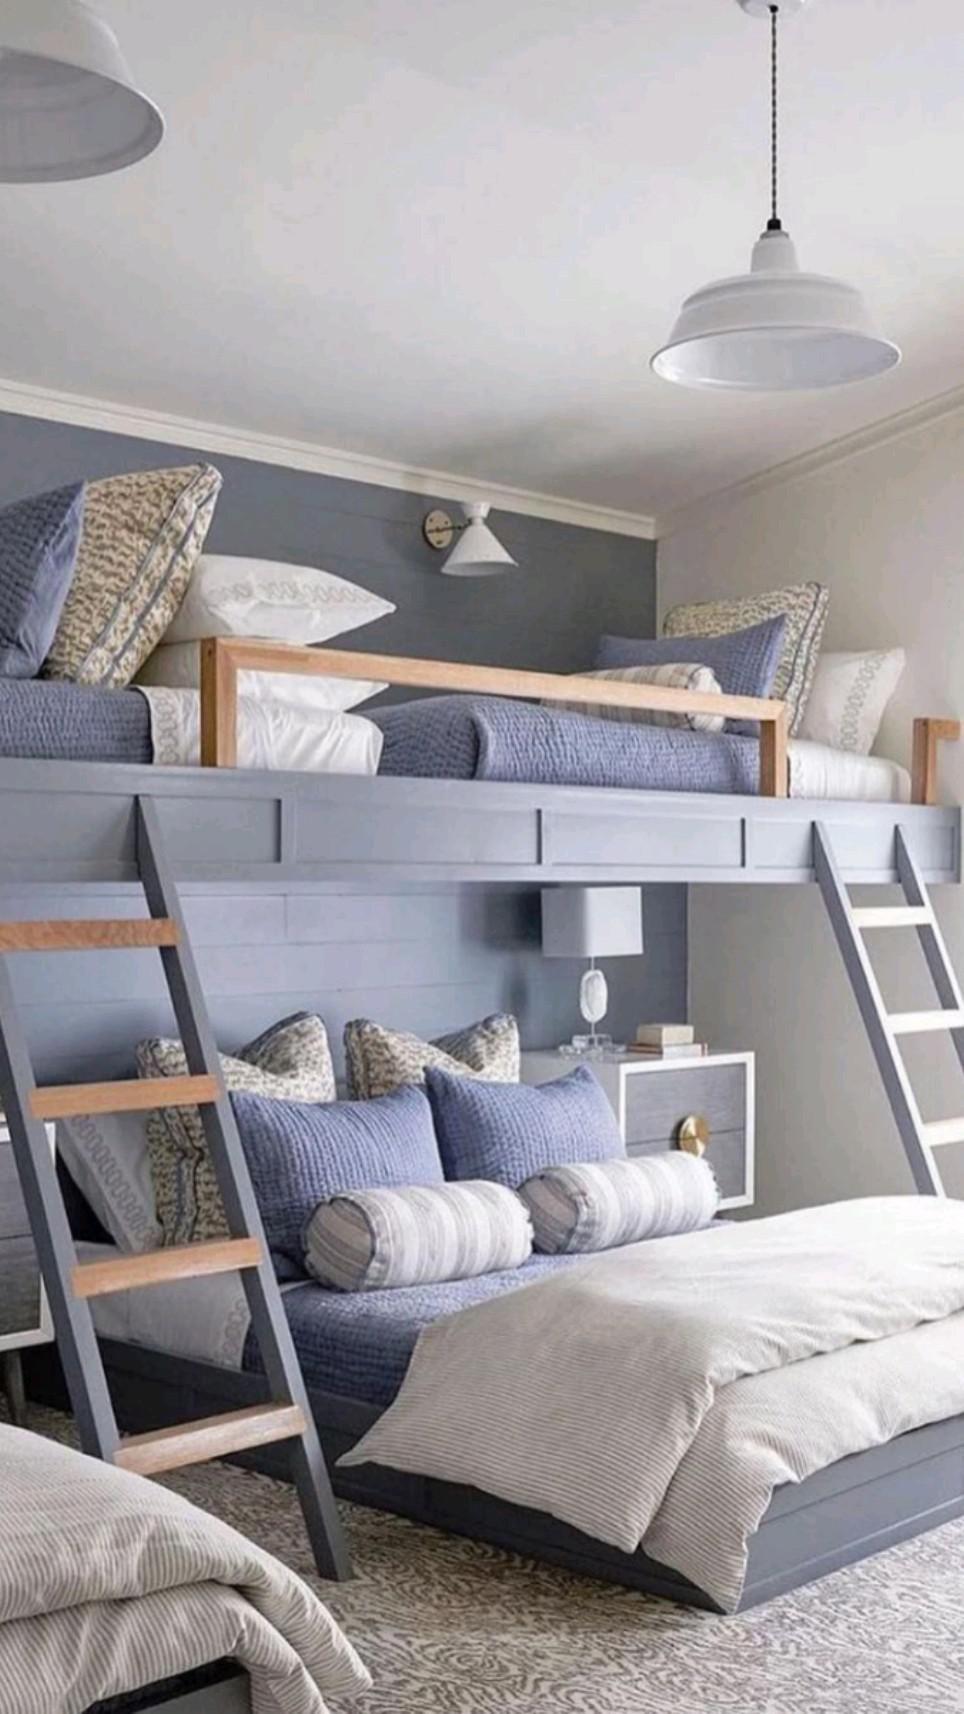 How To Make DIY Built-In Bunk Beds